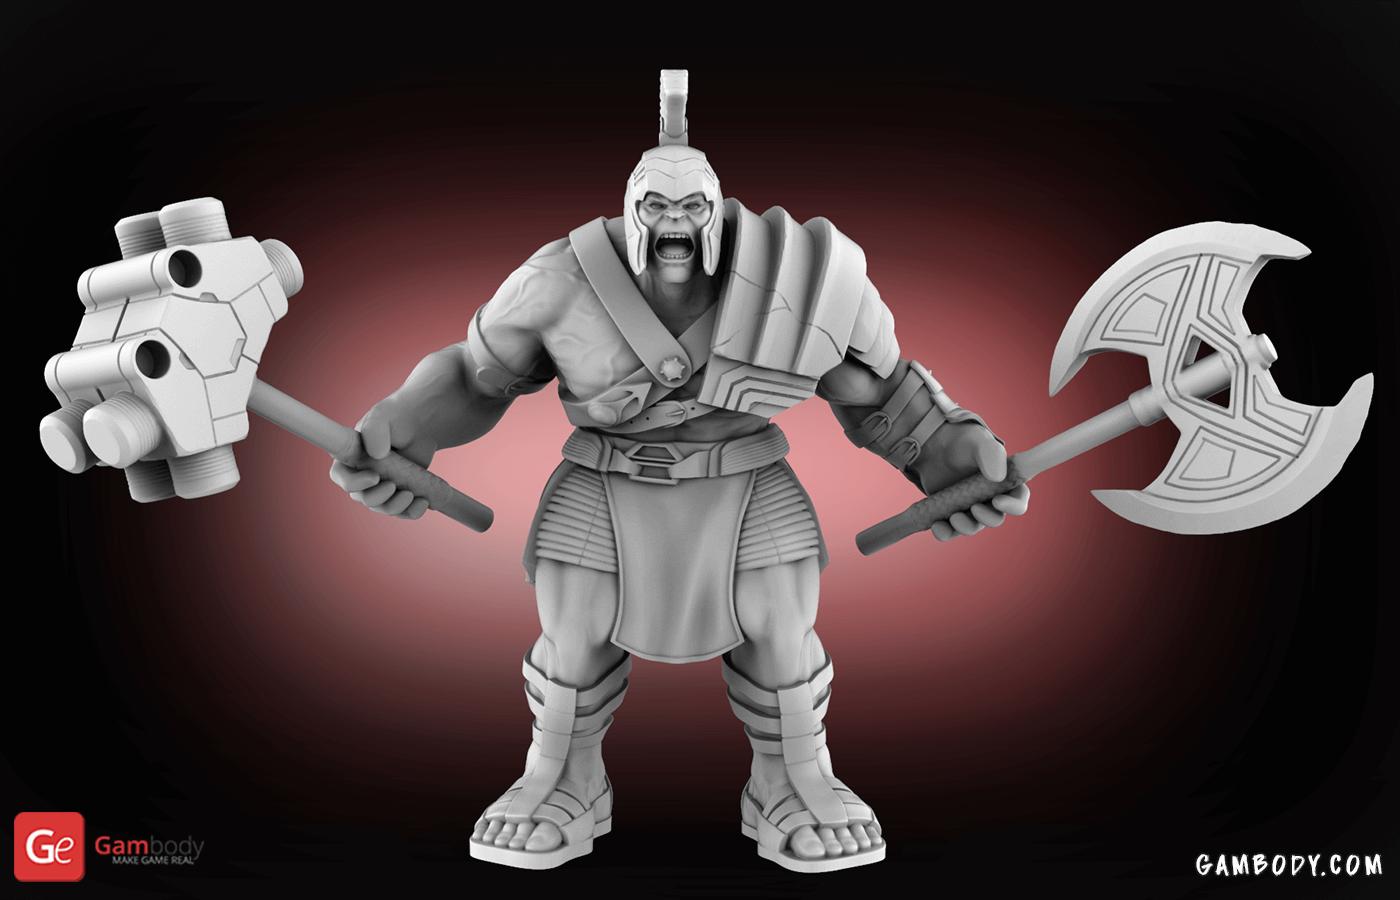 Armored Hulk 3D Printing Figurine